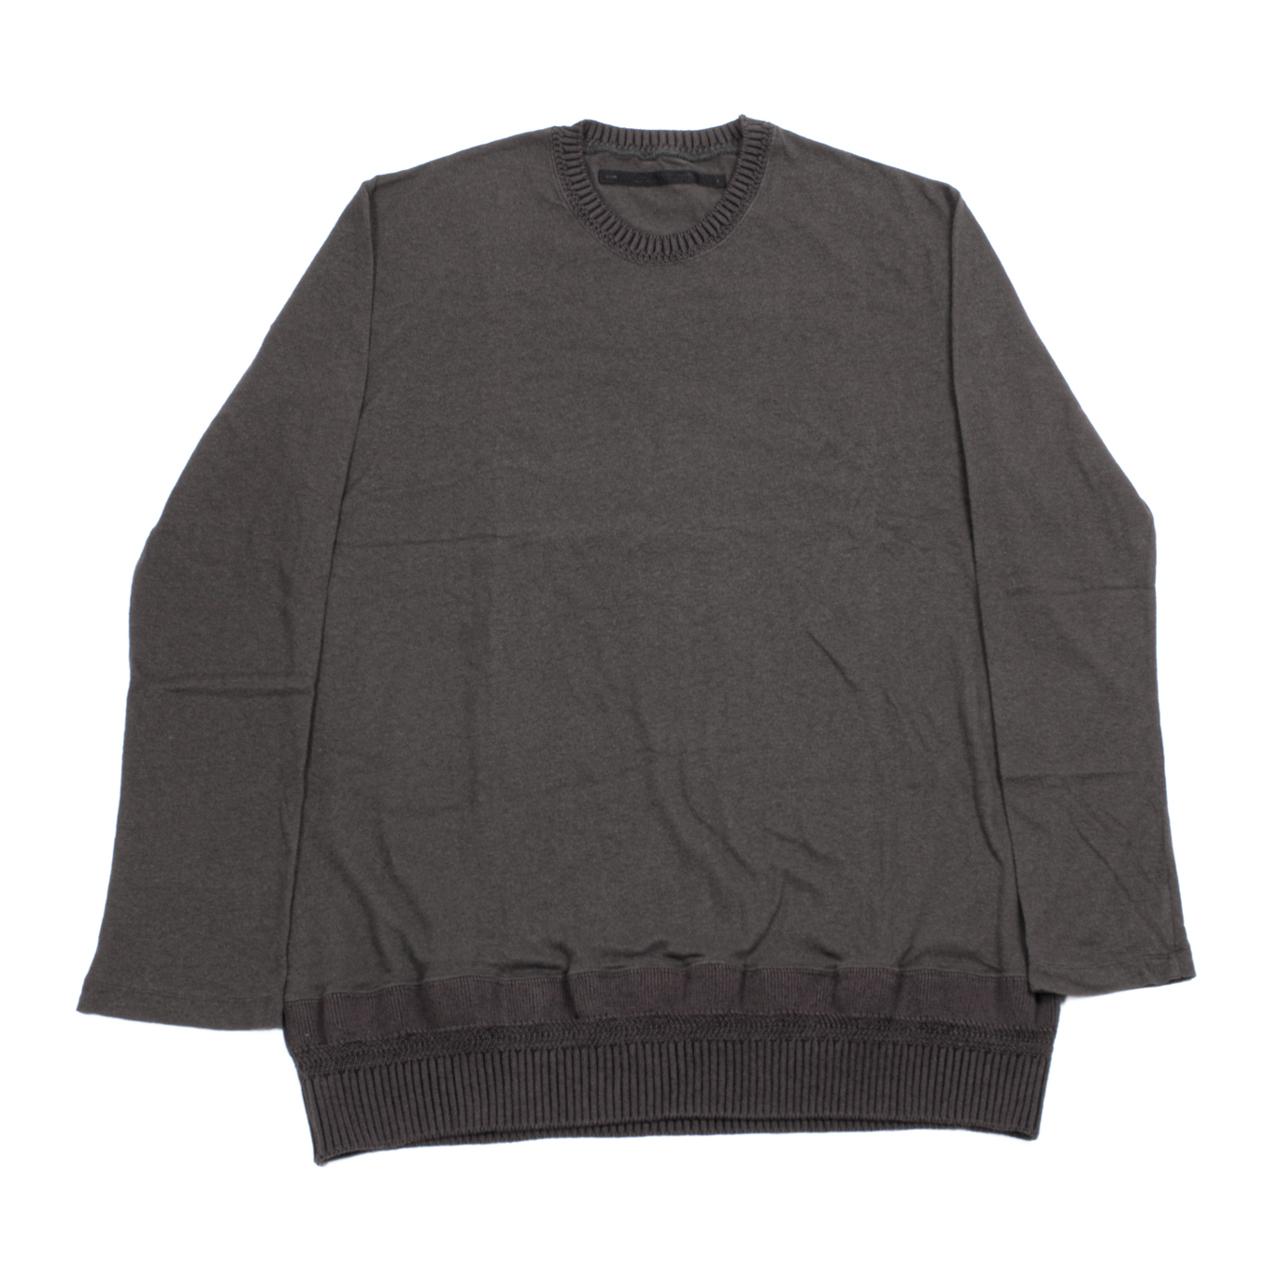 717CUM9-SLATE / ニットヘムロングスリーブTシャツ